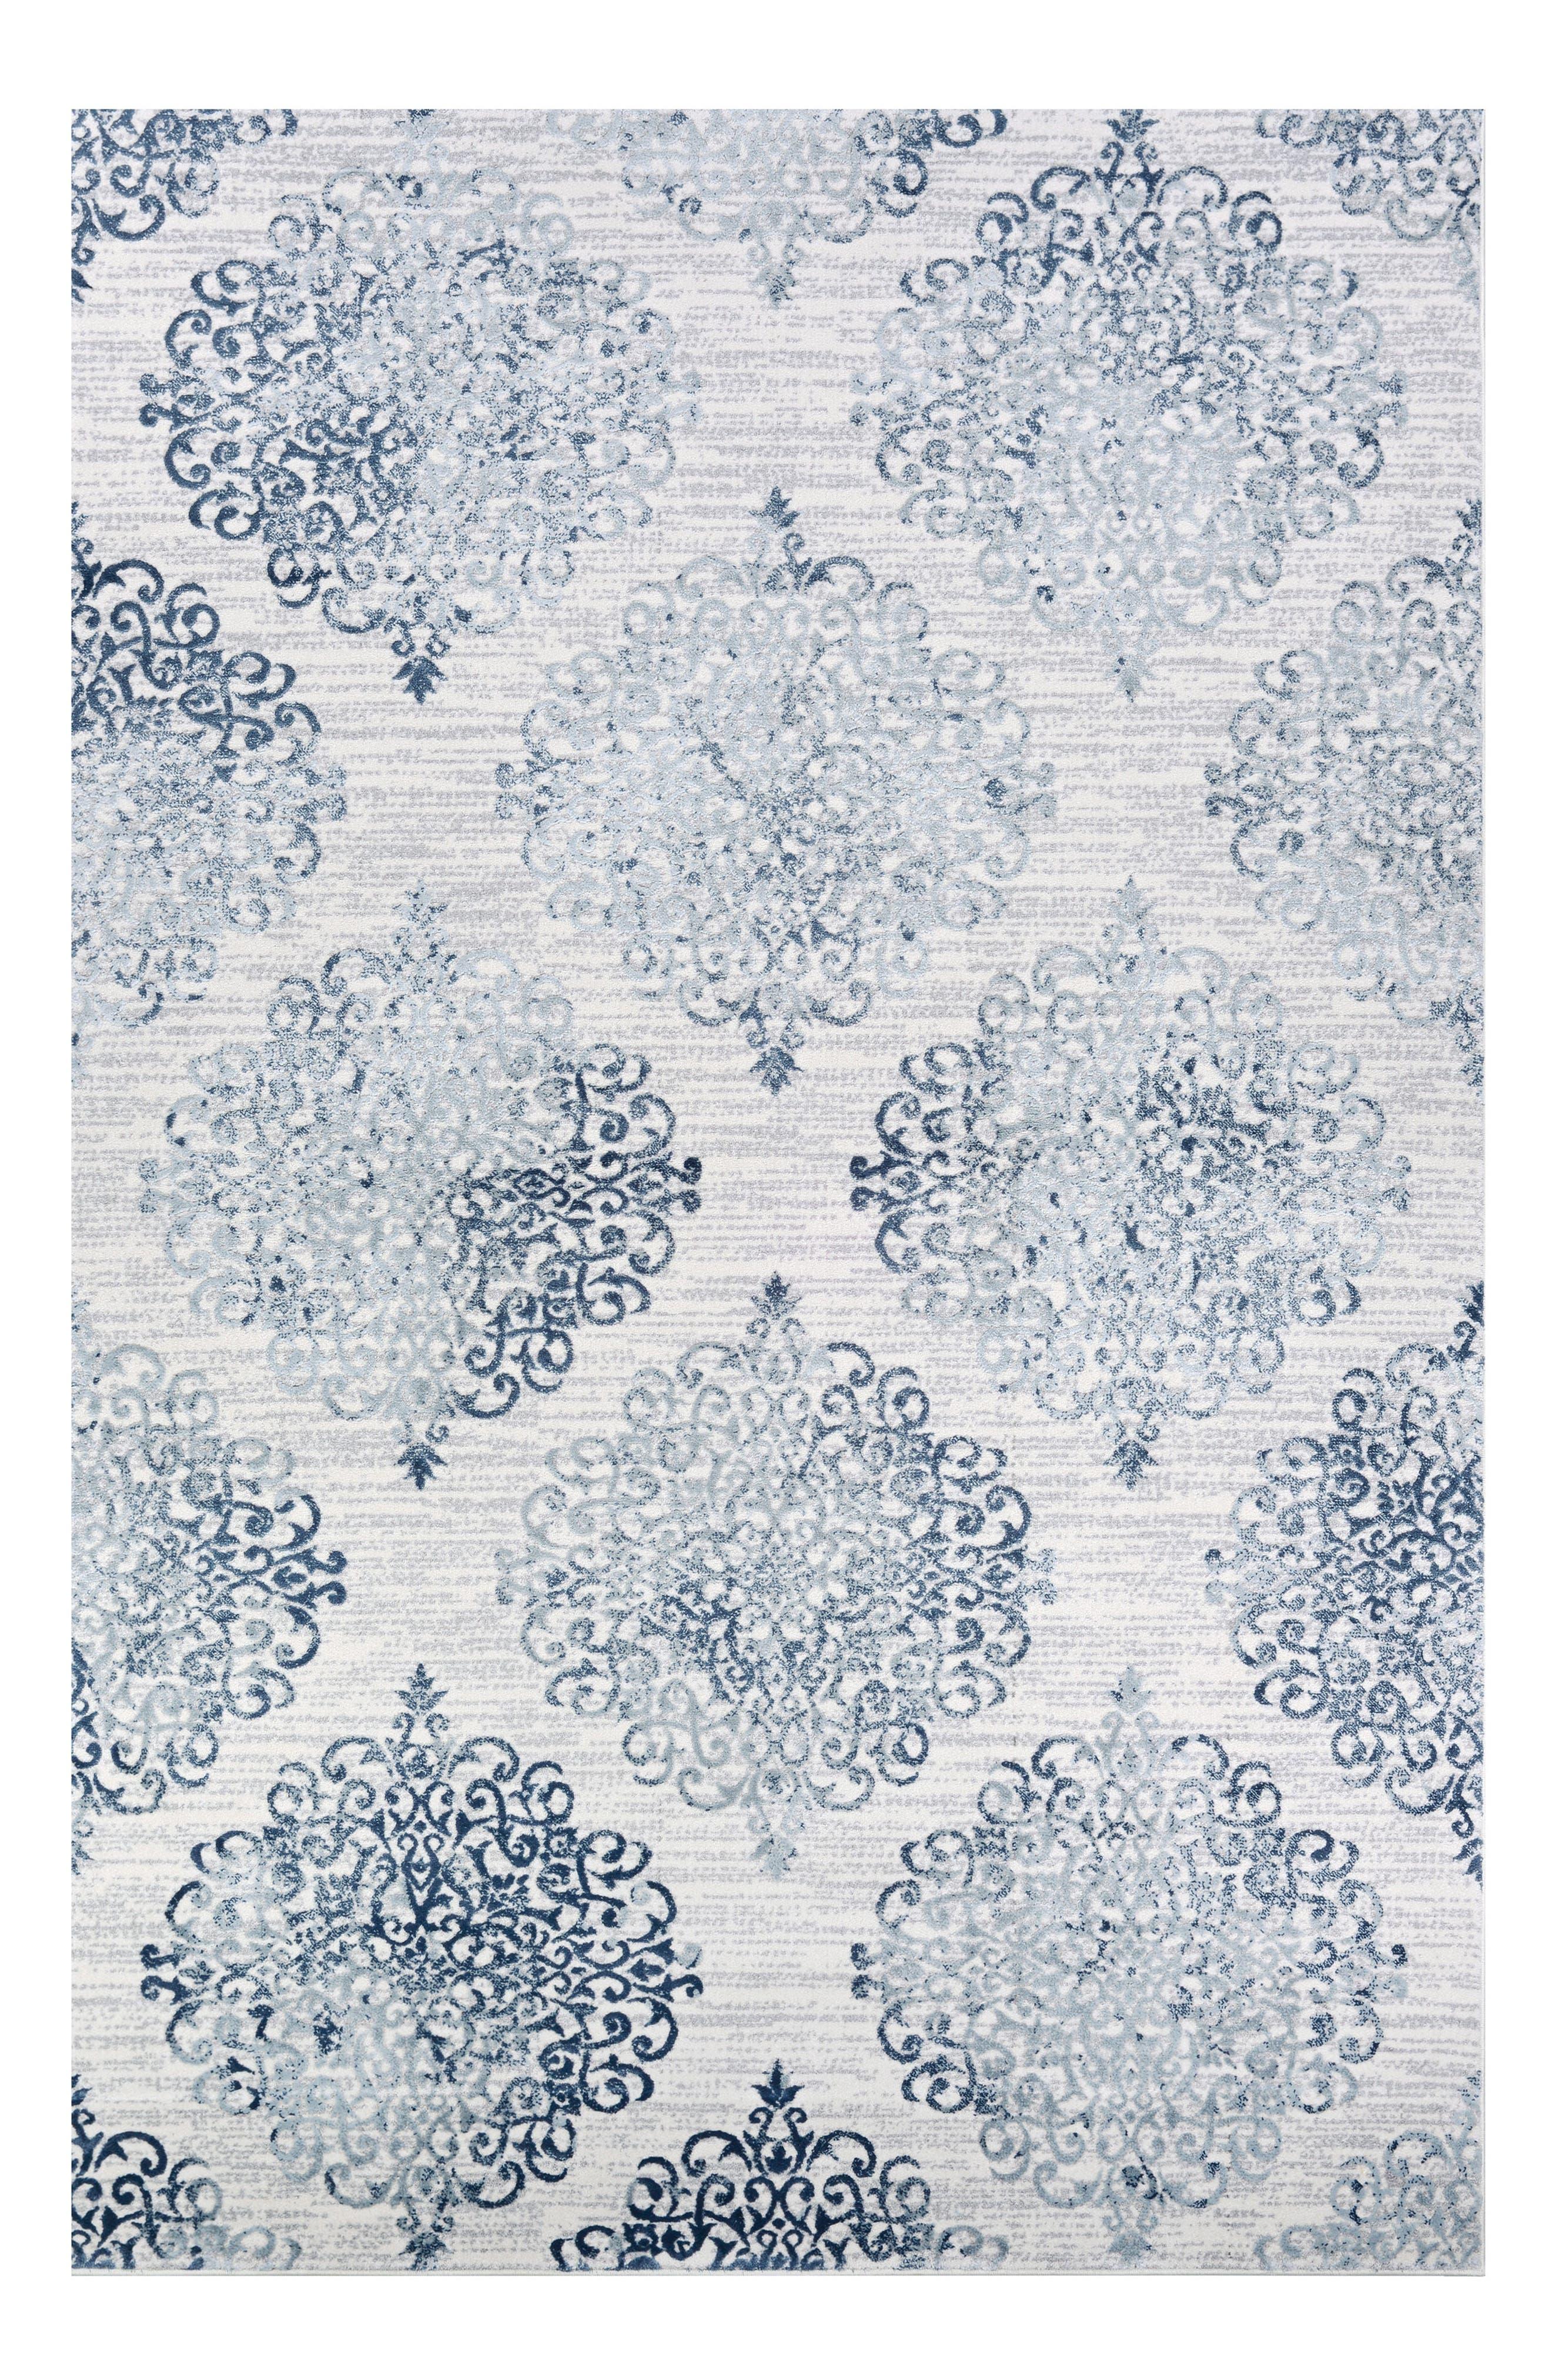 Calinda Collection Marlowe Rug, Main, color, STEEL BLUE - IVORY